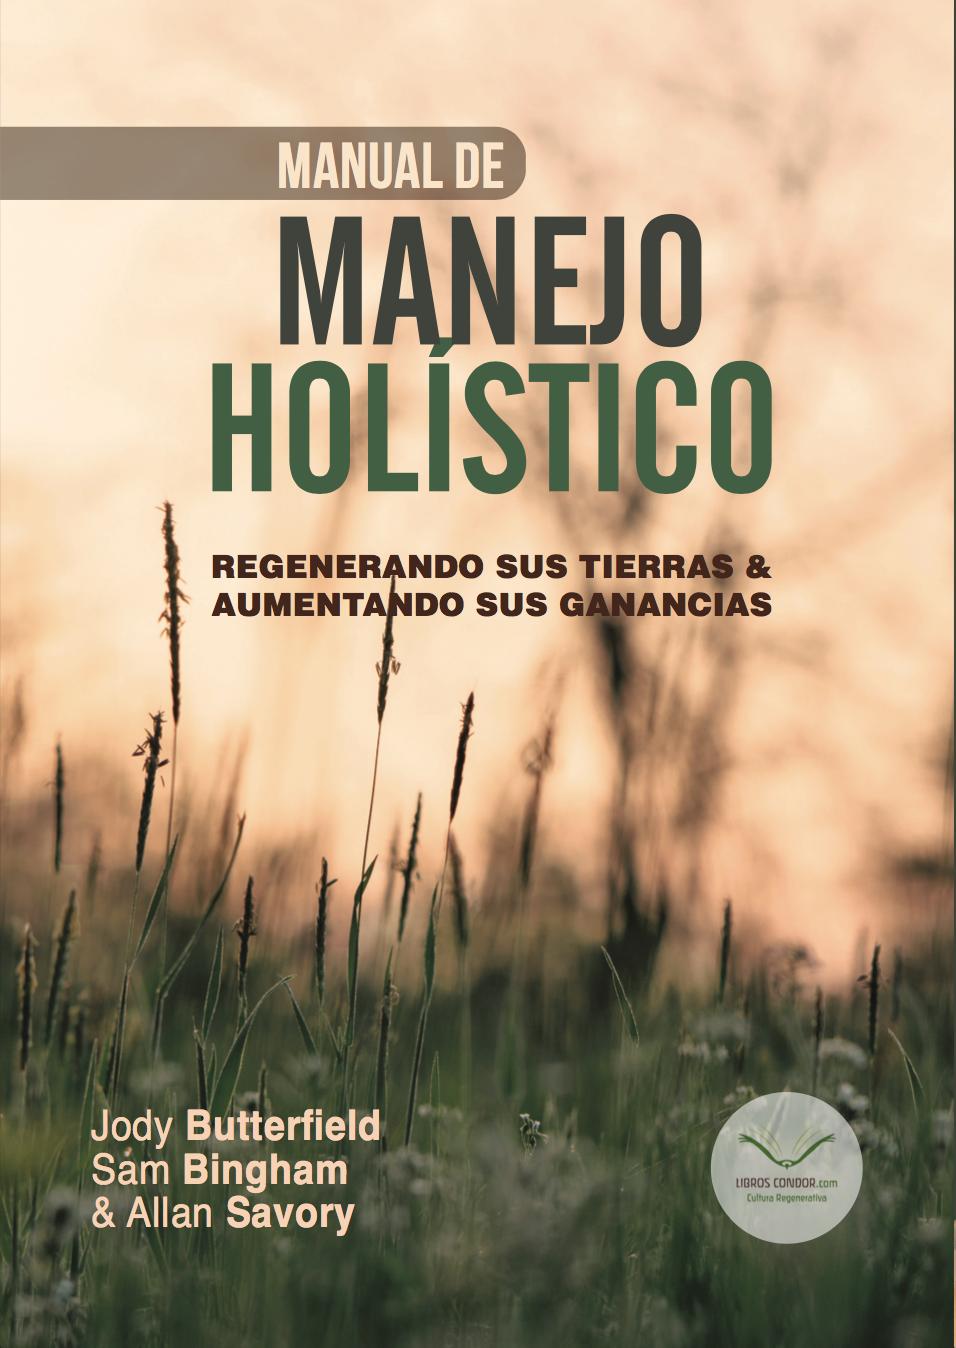 MANUAL de MANEJO HOLÍSTICO